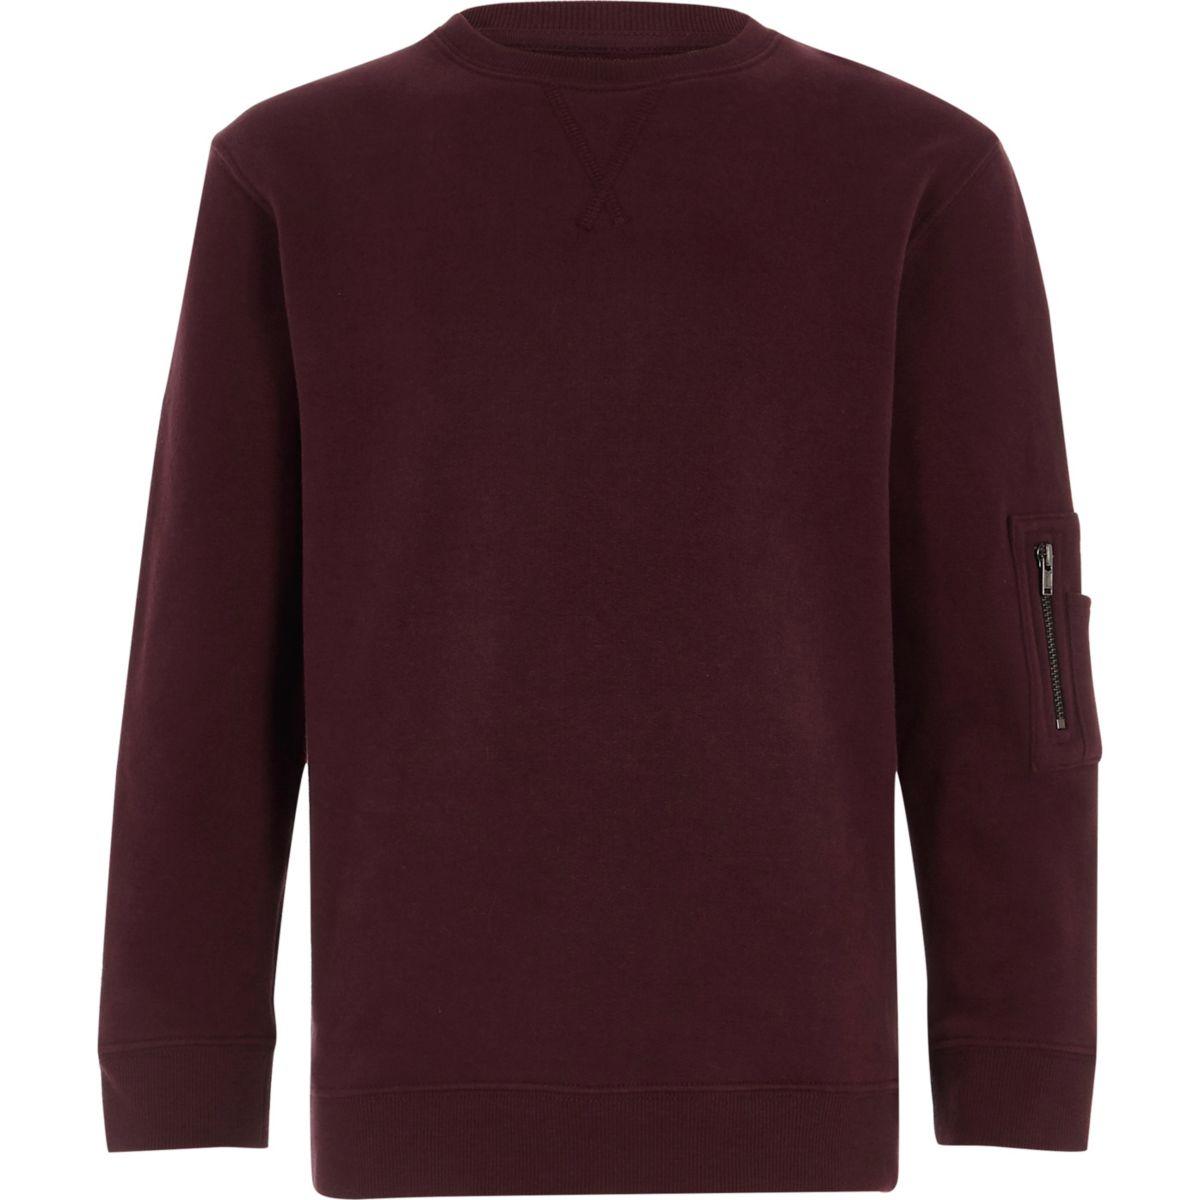 Boys burgundy zip pocket sleeve sweatshirt